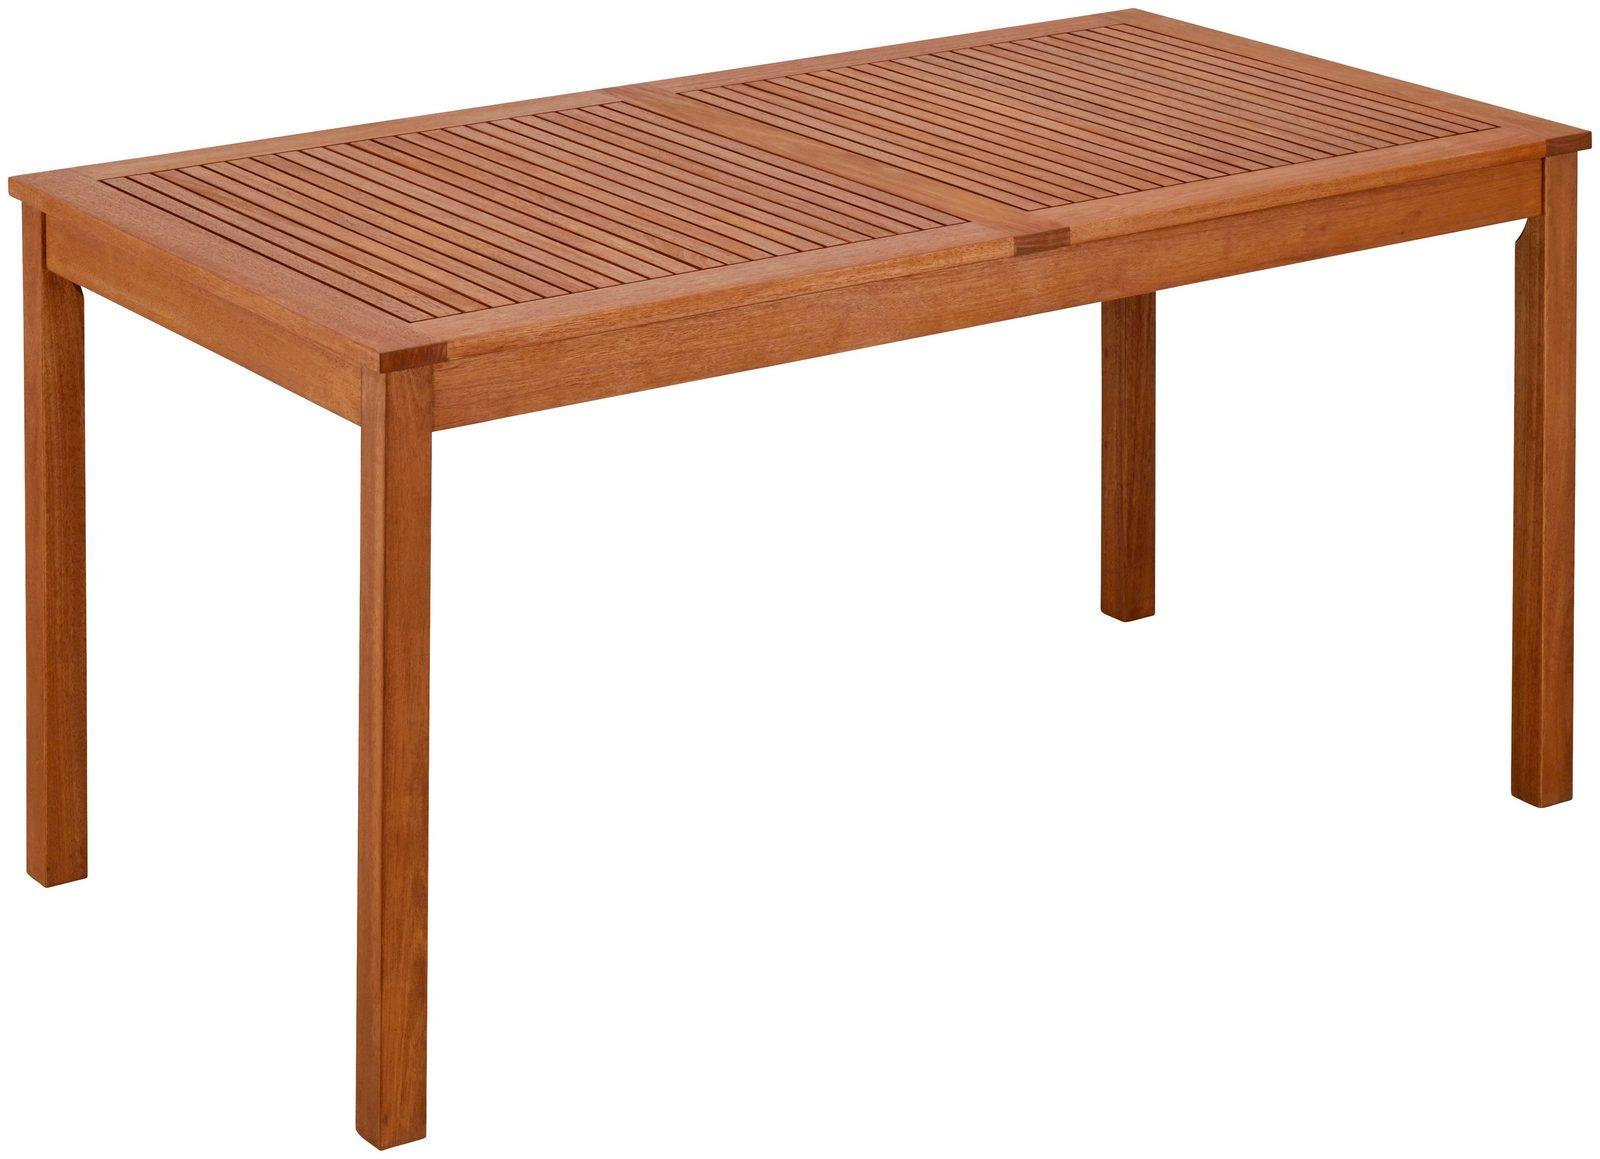 Gartentisch »Melbourne«, Eukalyptusholz, braun